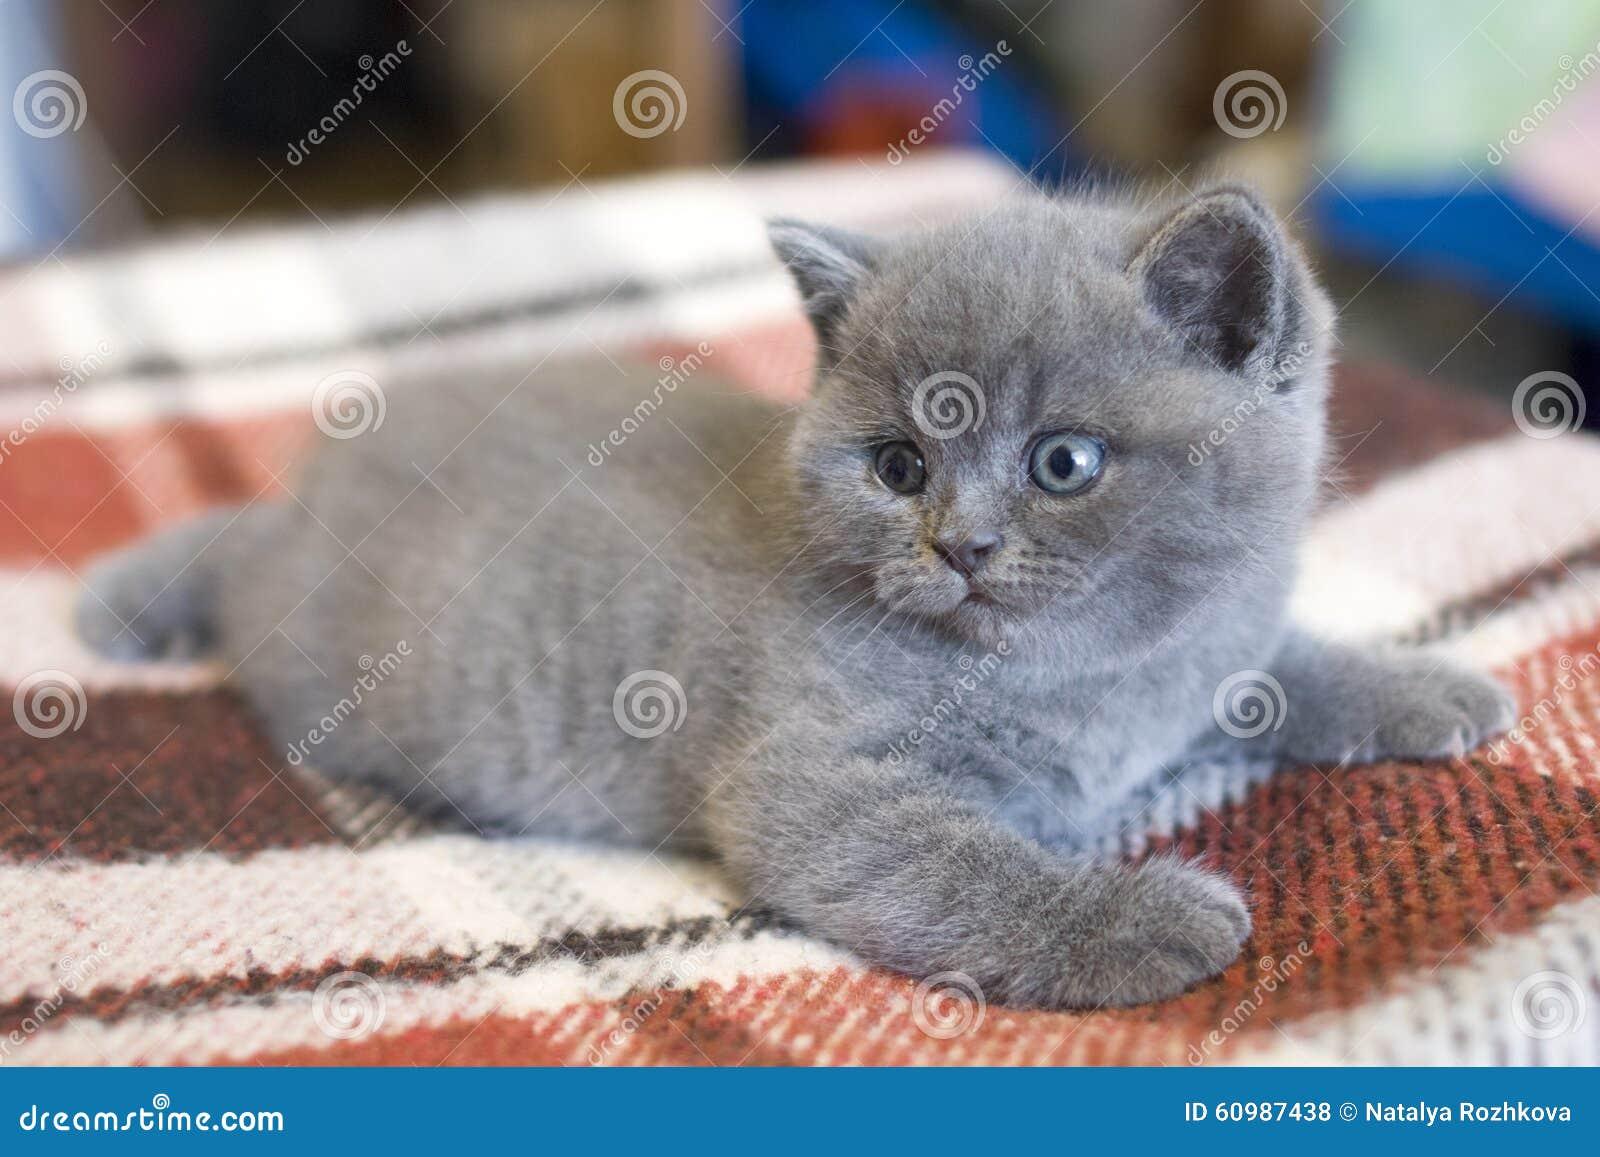 Little Cute British Kitten Stock Photo Image Of House Blue 60987438